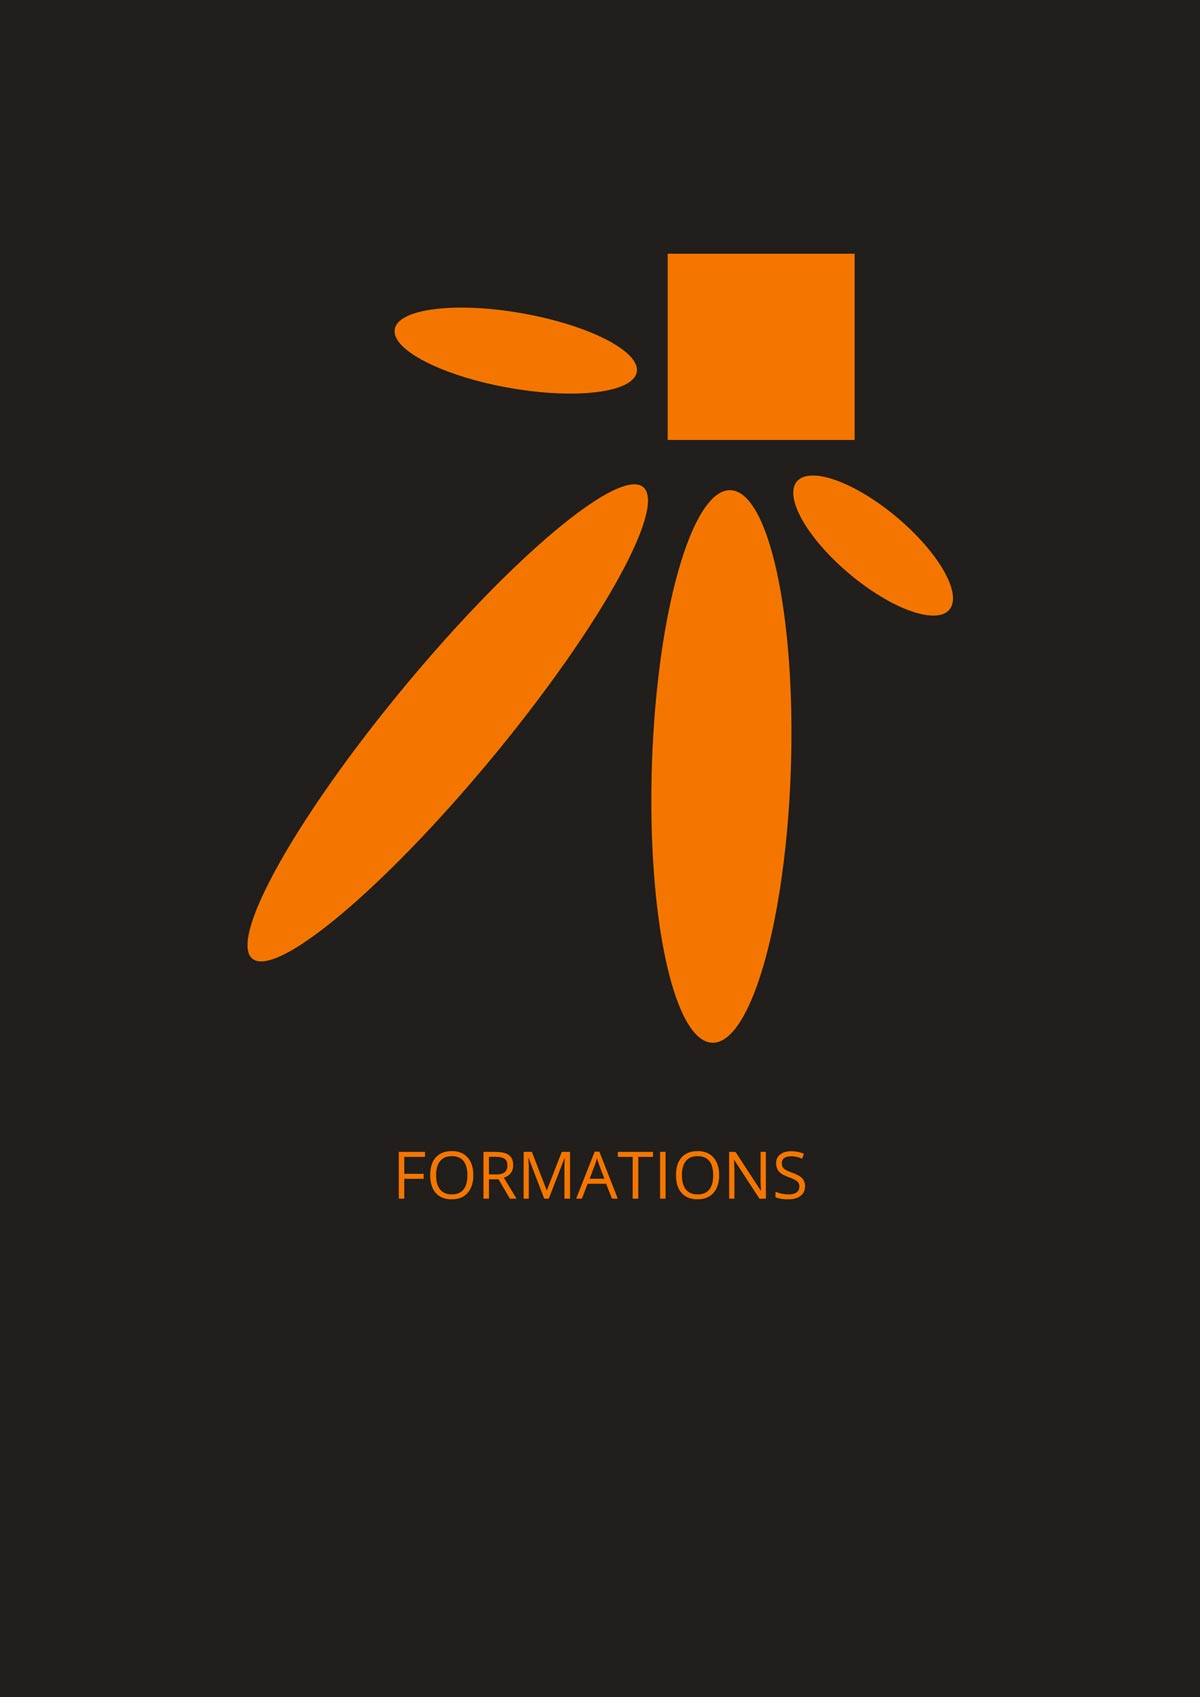 CRA Formation